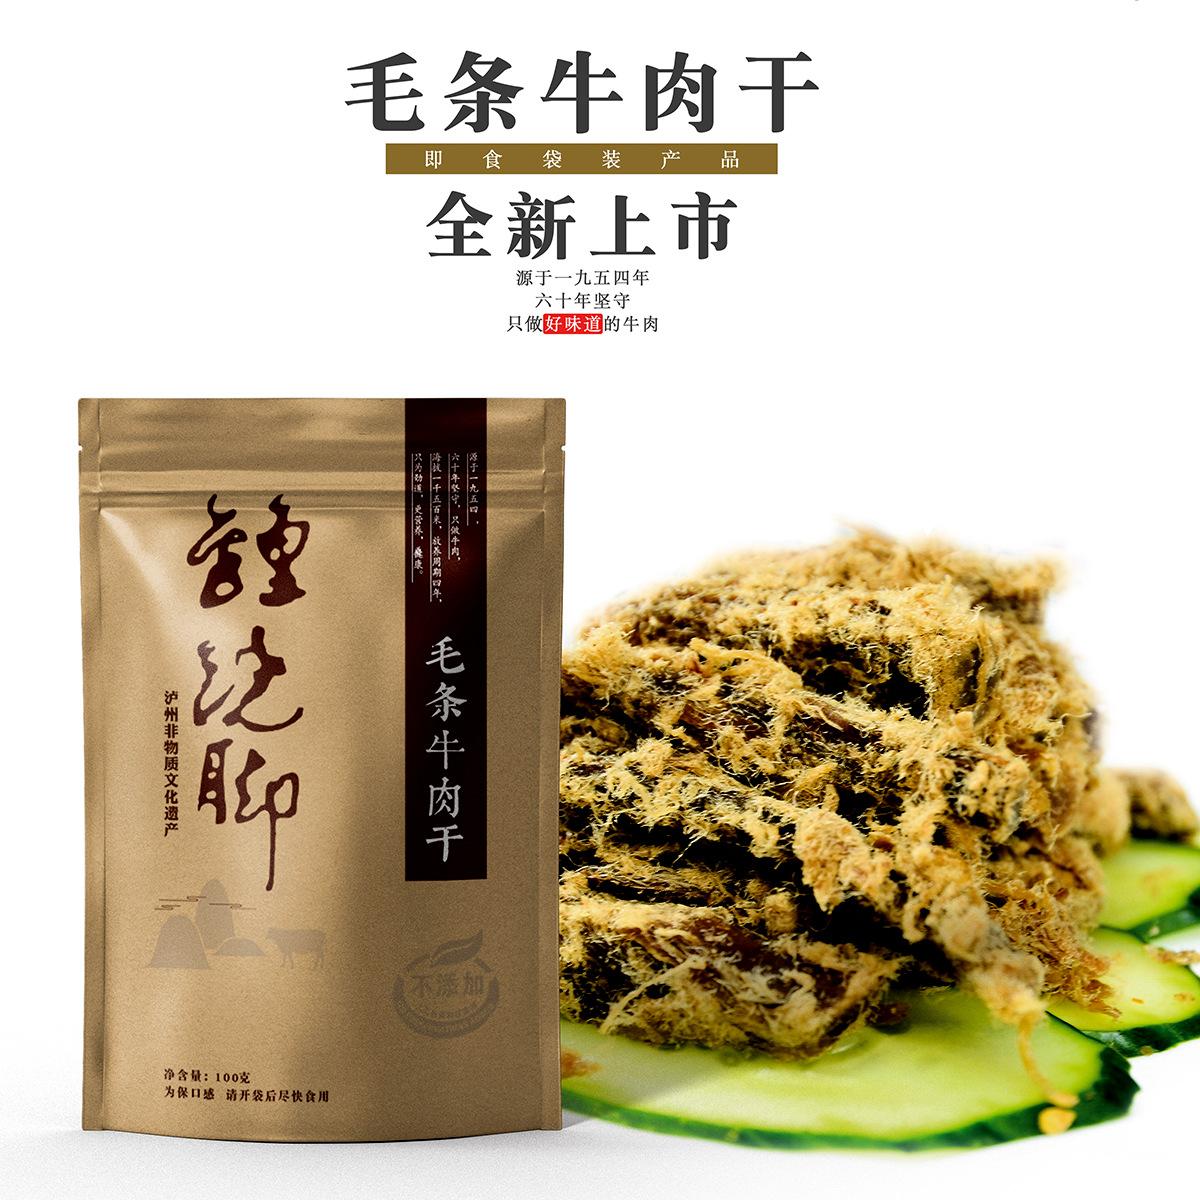 Sichuan specialty zhongqiaojiao Gulin beef jerky, spicy osmanthus flavor, sliced beef jerky snack